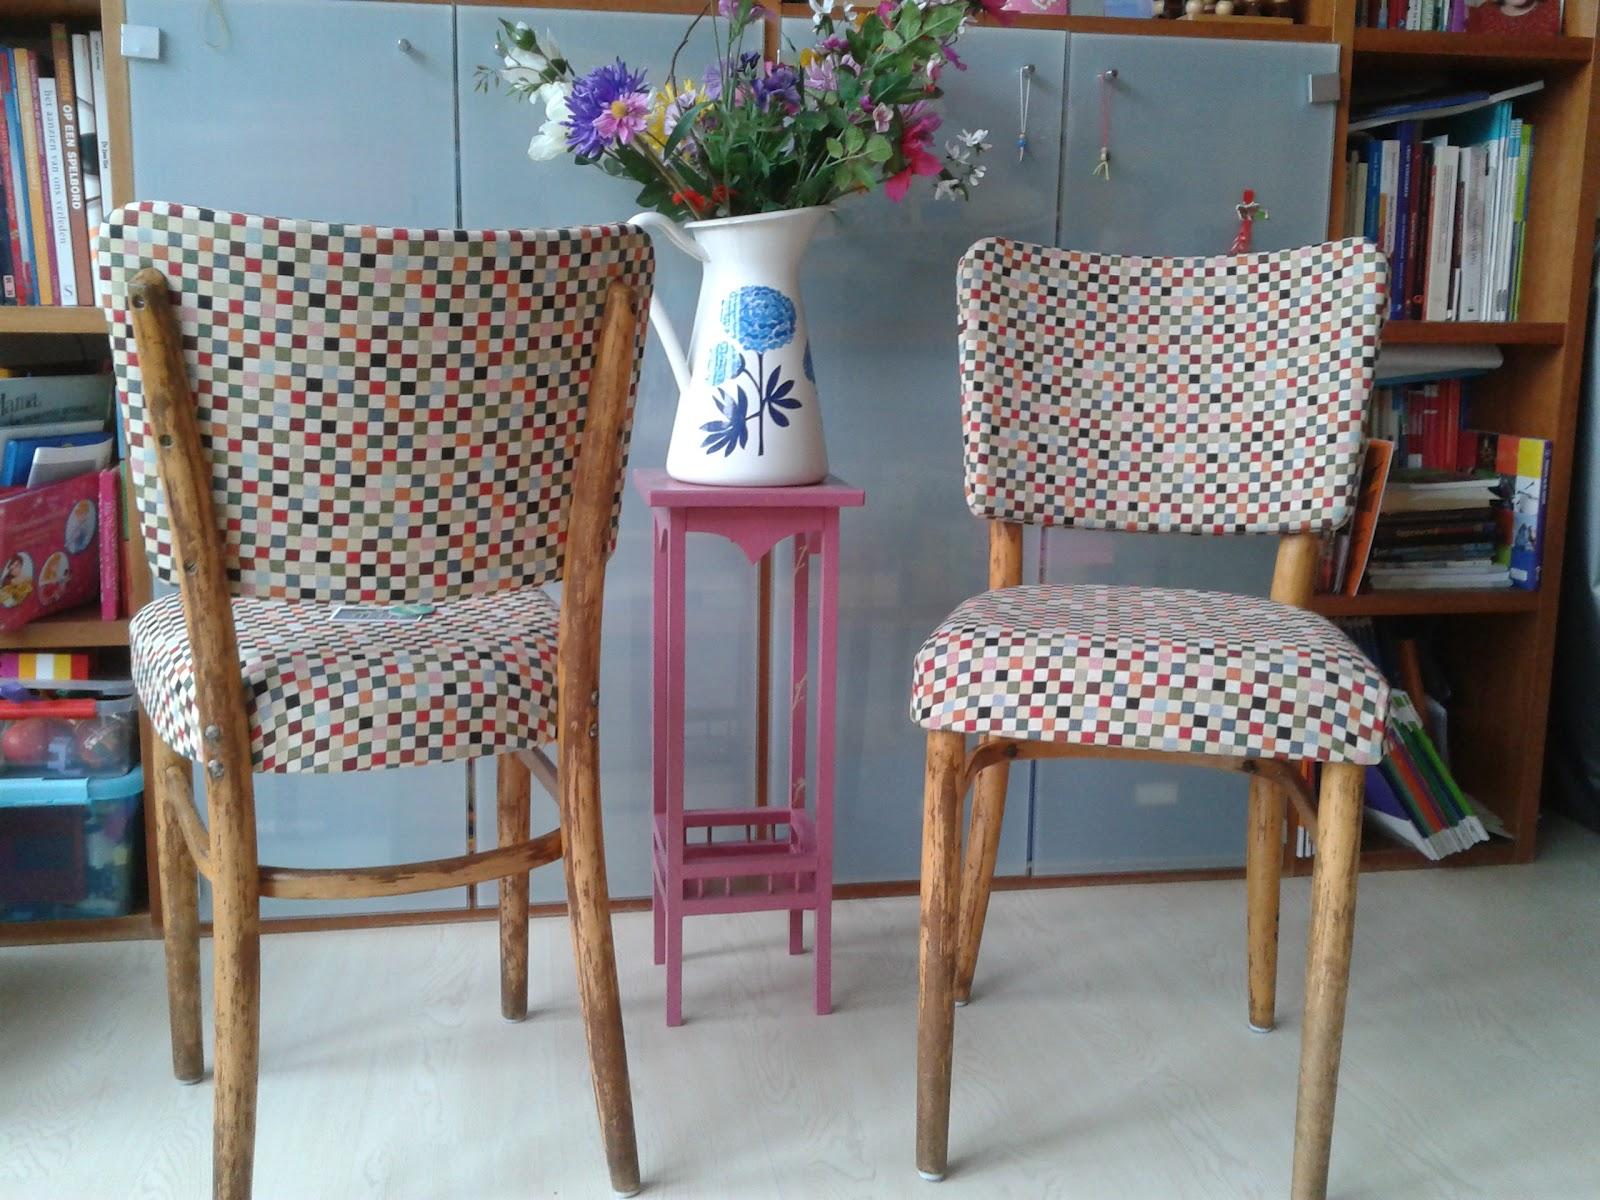 Barok stoel opknappen best how to reupholster an antique chair